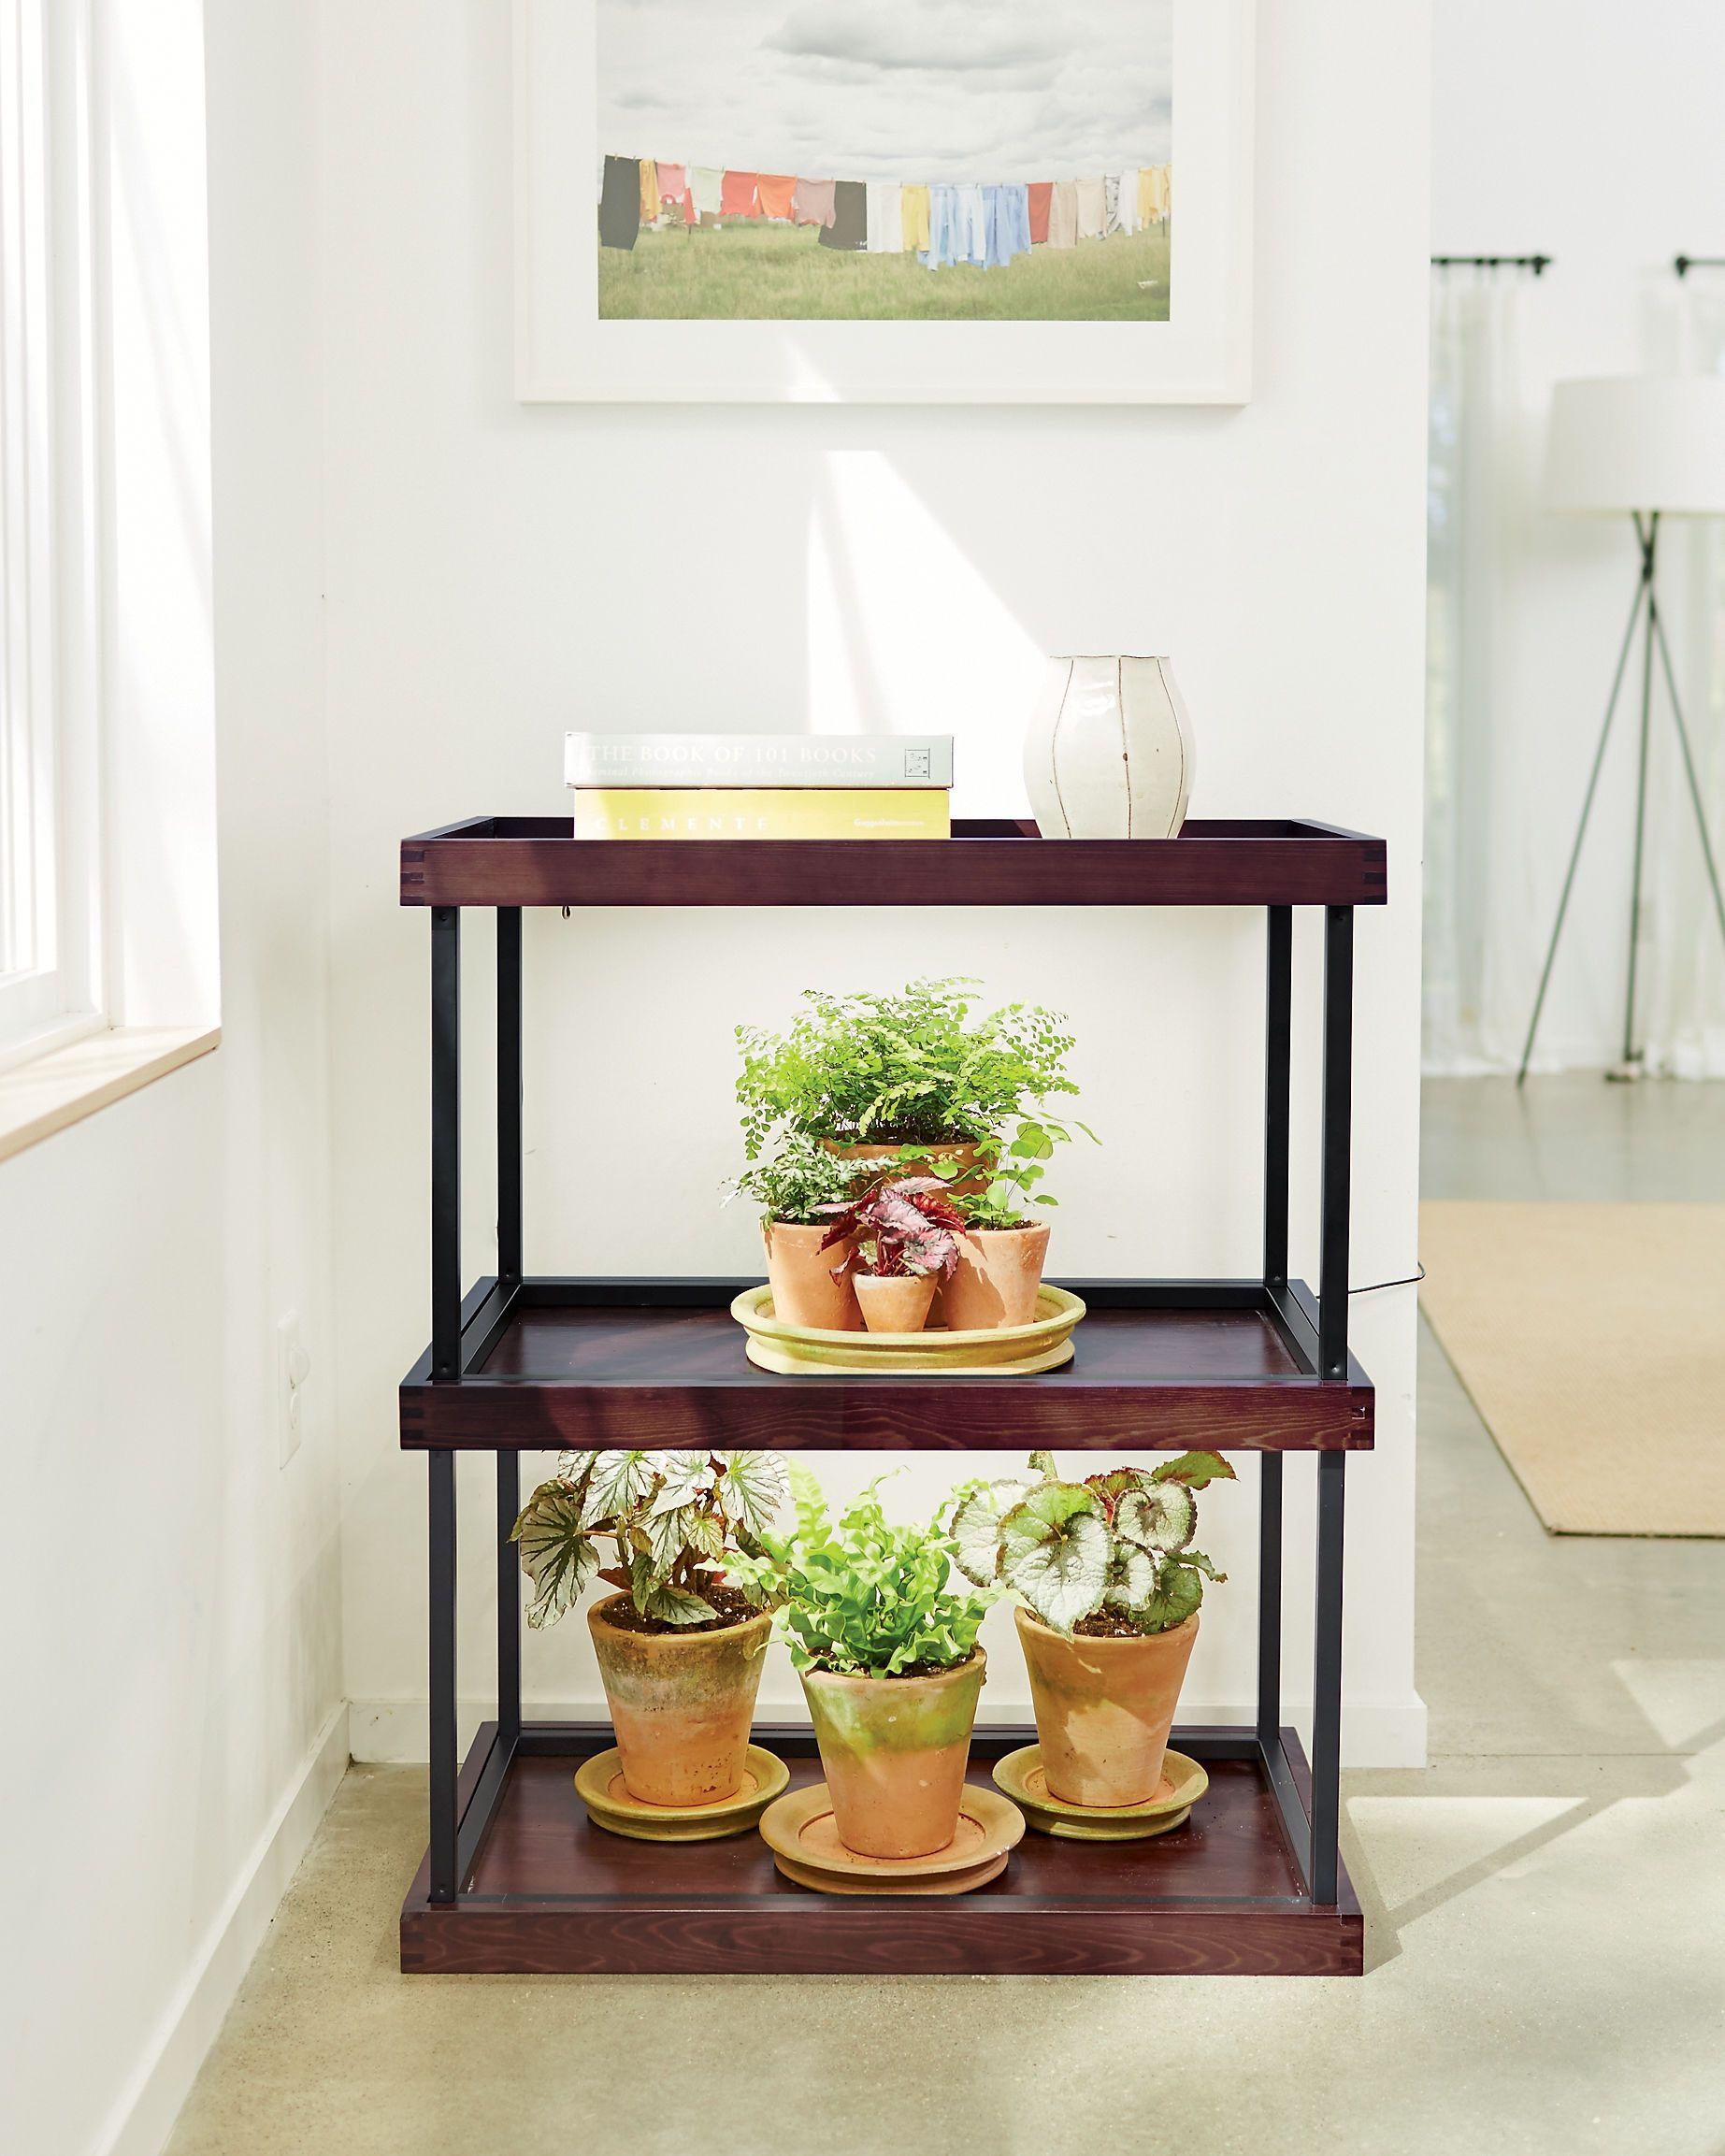 Small Table Top Grow Light with T5 Bulbs